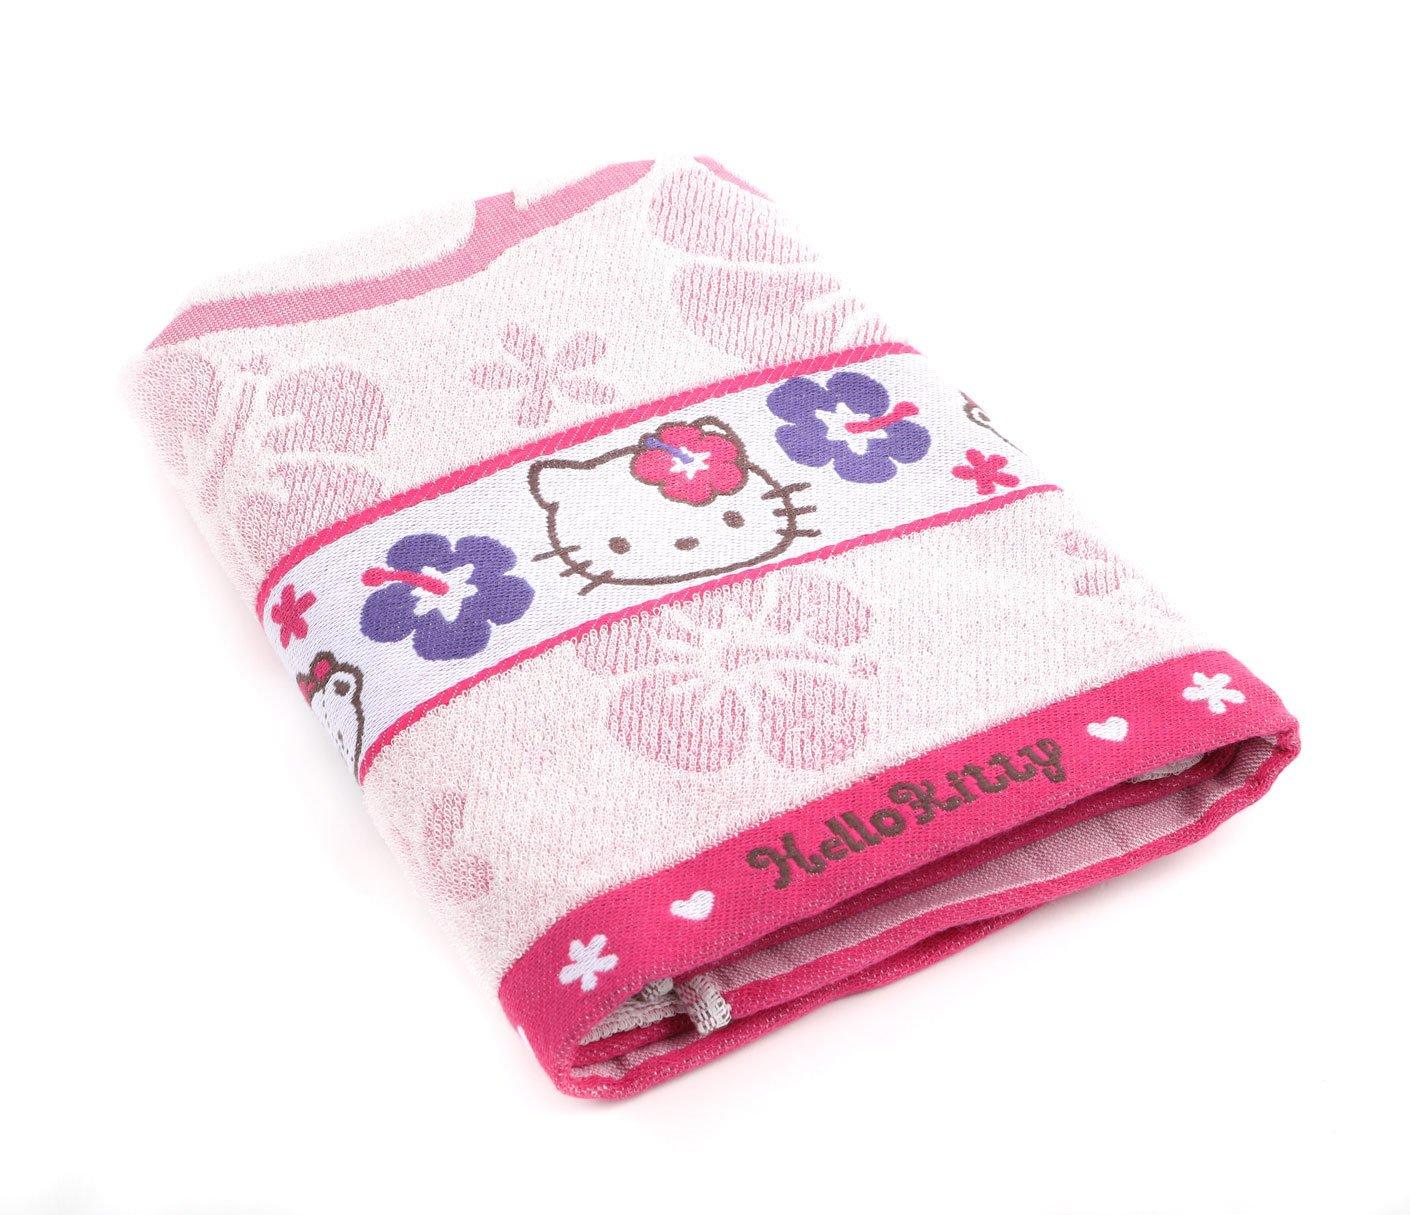 db9178ec0 Amazon.com : SANRIO Hello Kitty Bath Towel: Hibiscus Flower : Baby